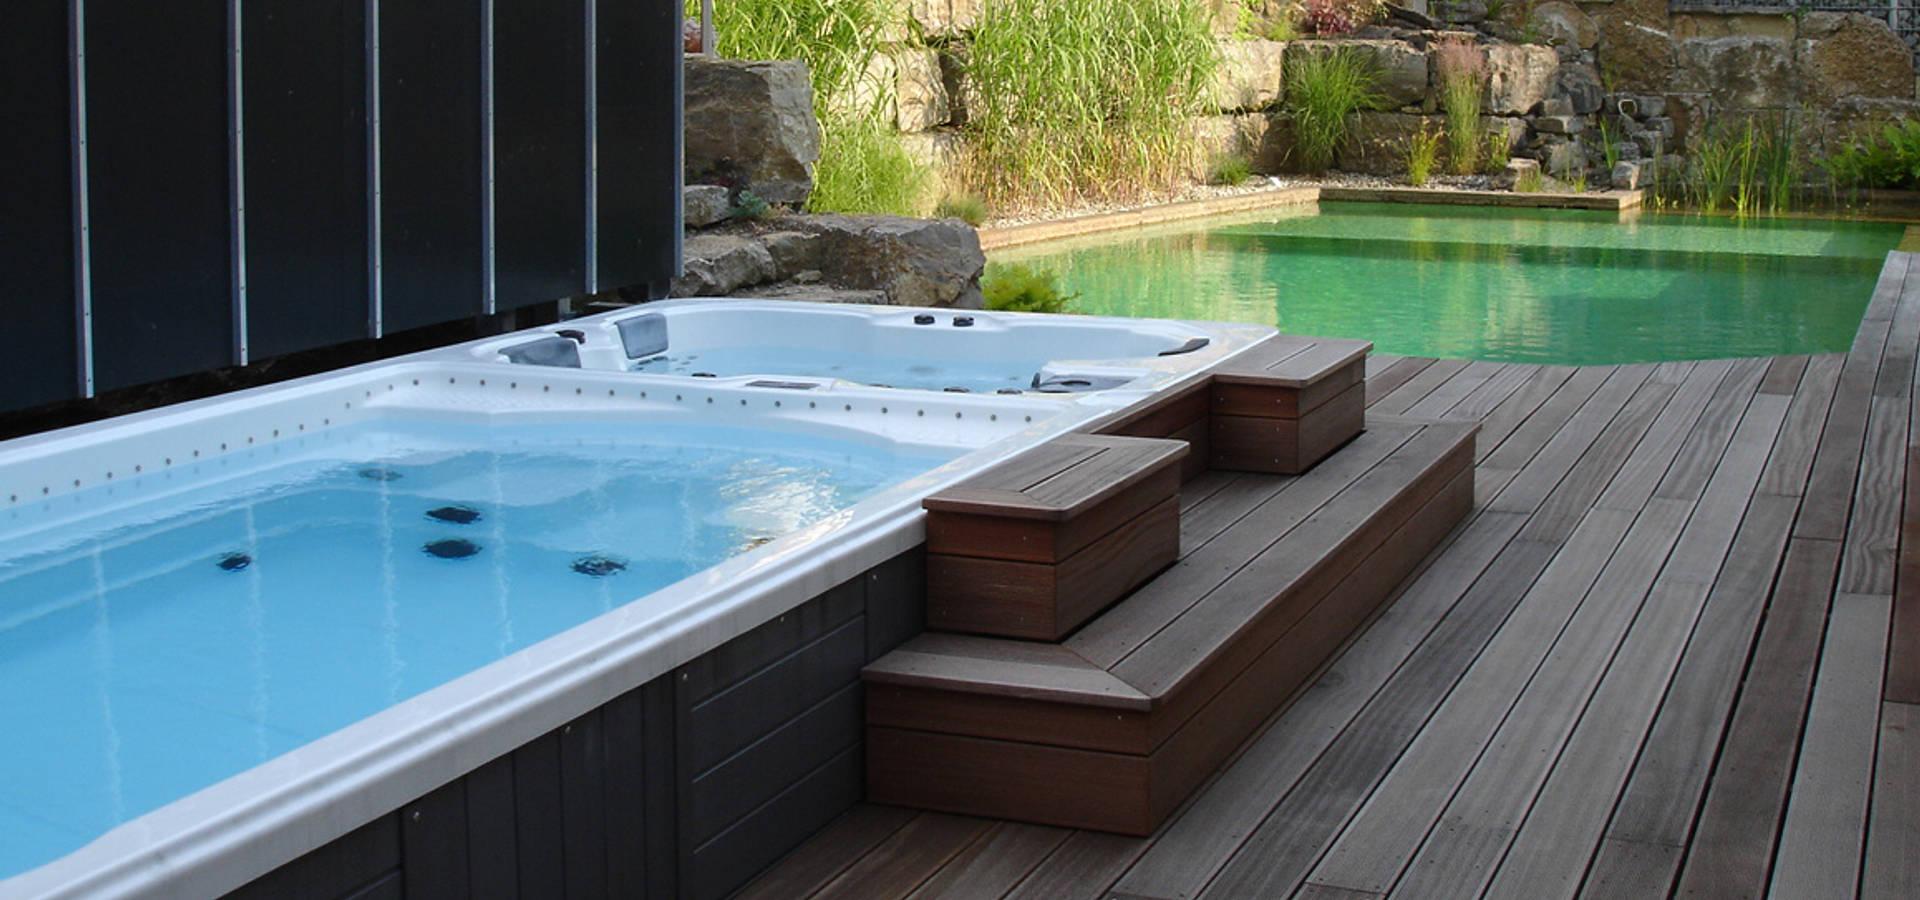 viva aqua gmbh geht nicht gibts nicht homify. Black Bedroom Furniture Sets. Home Design Ideas